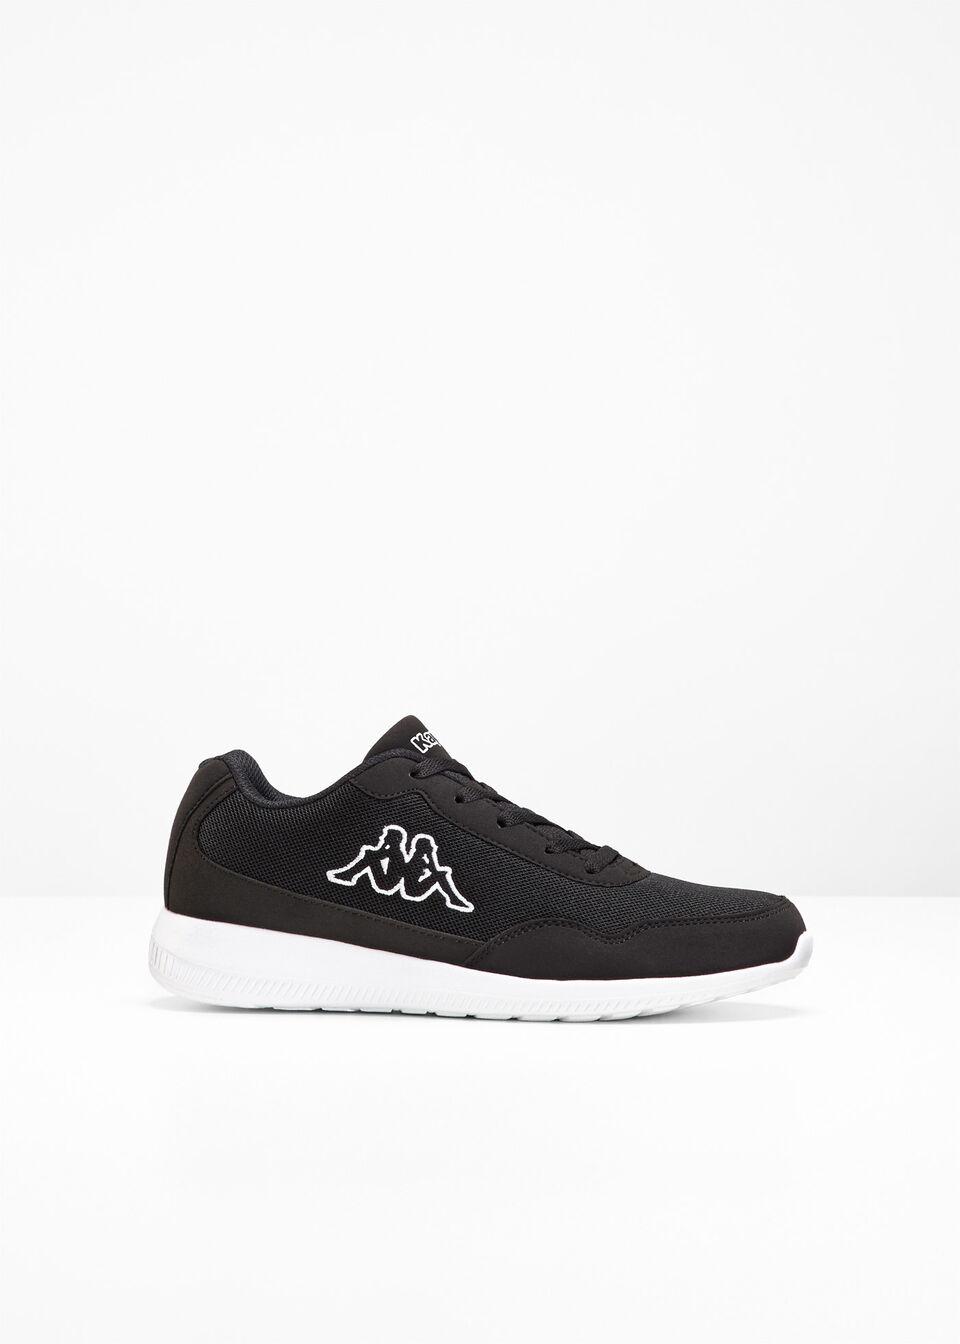 e3ca2f2d Sneakersy Kappa czarny - Sklep internetowy